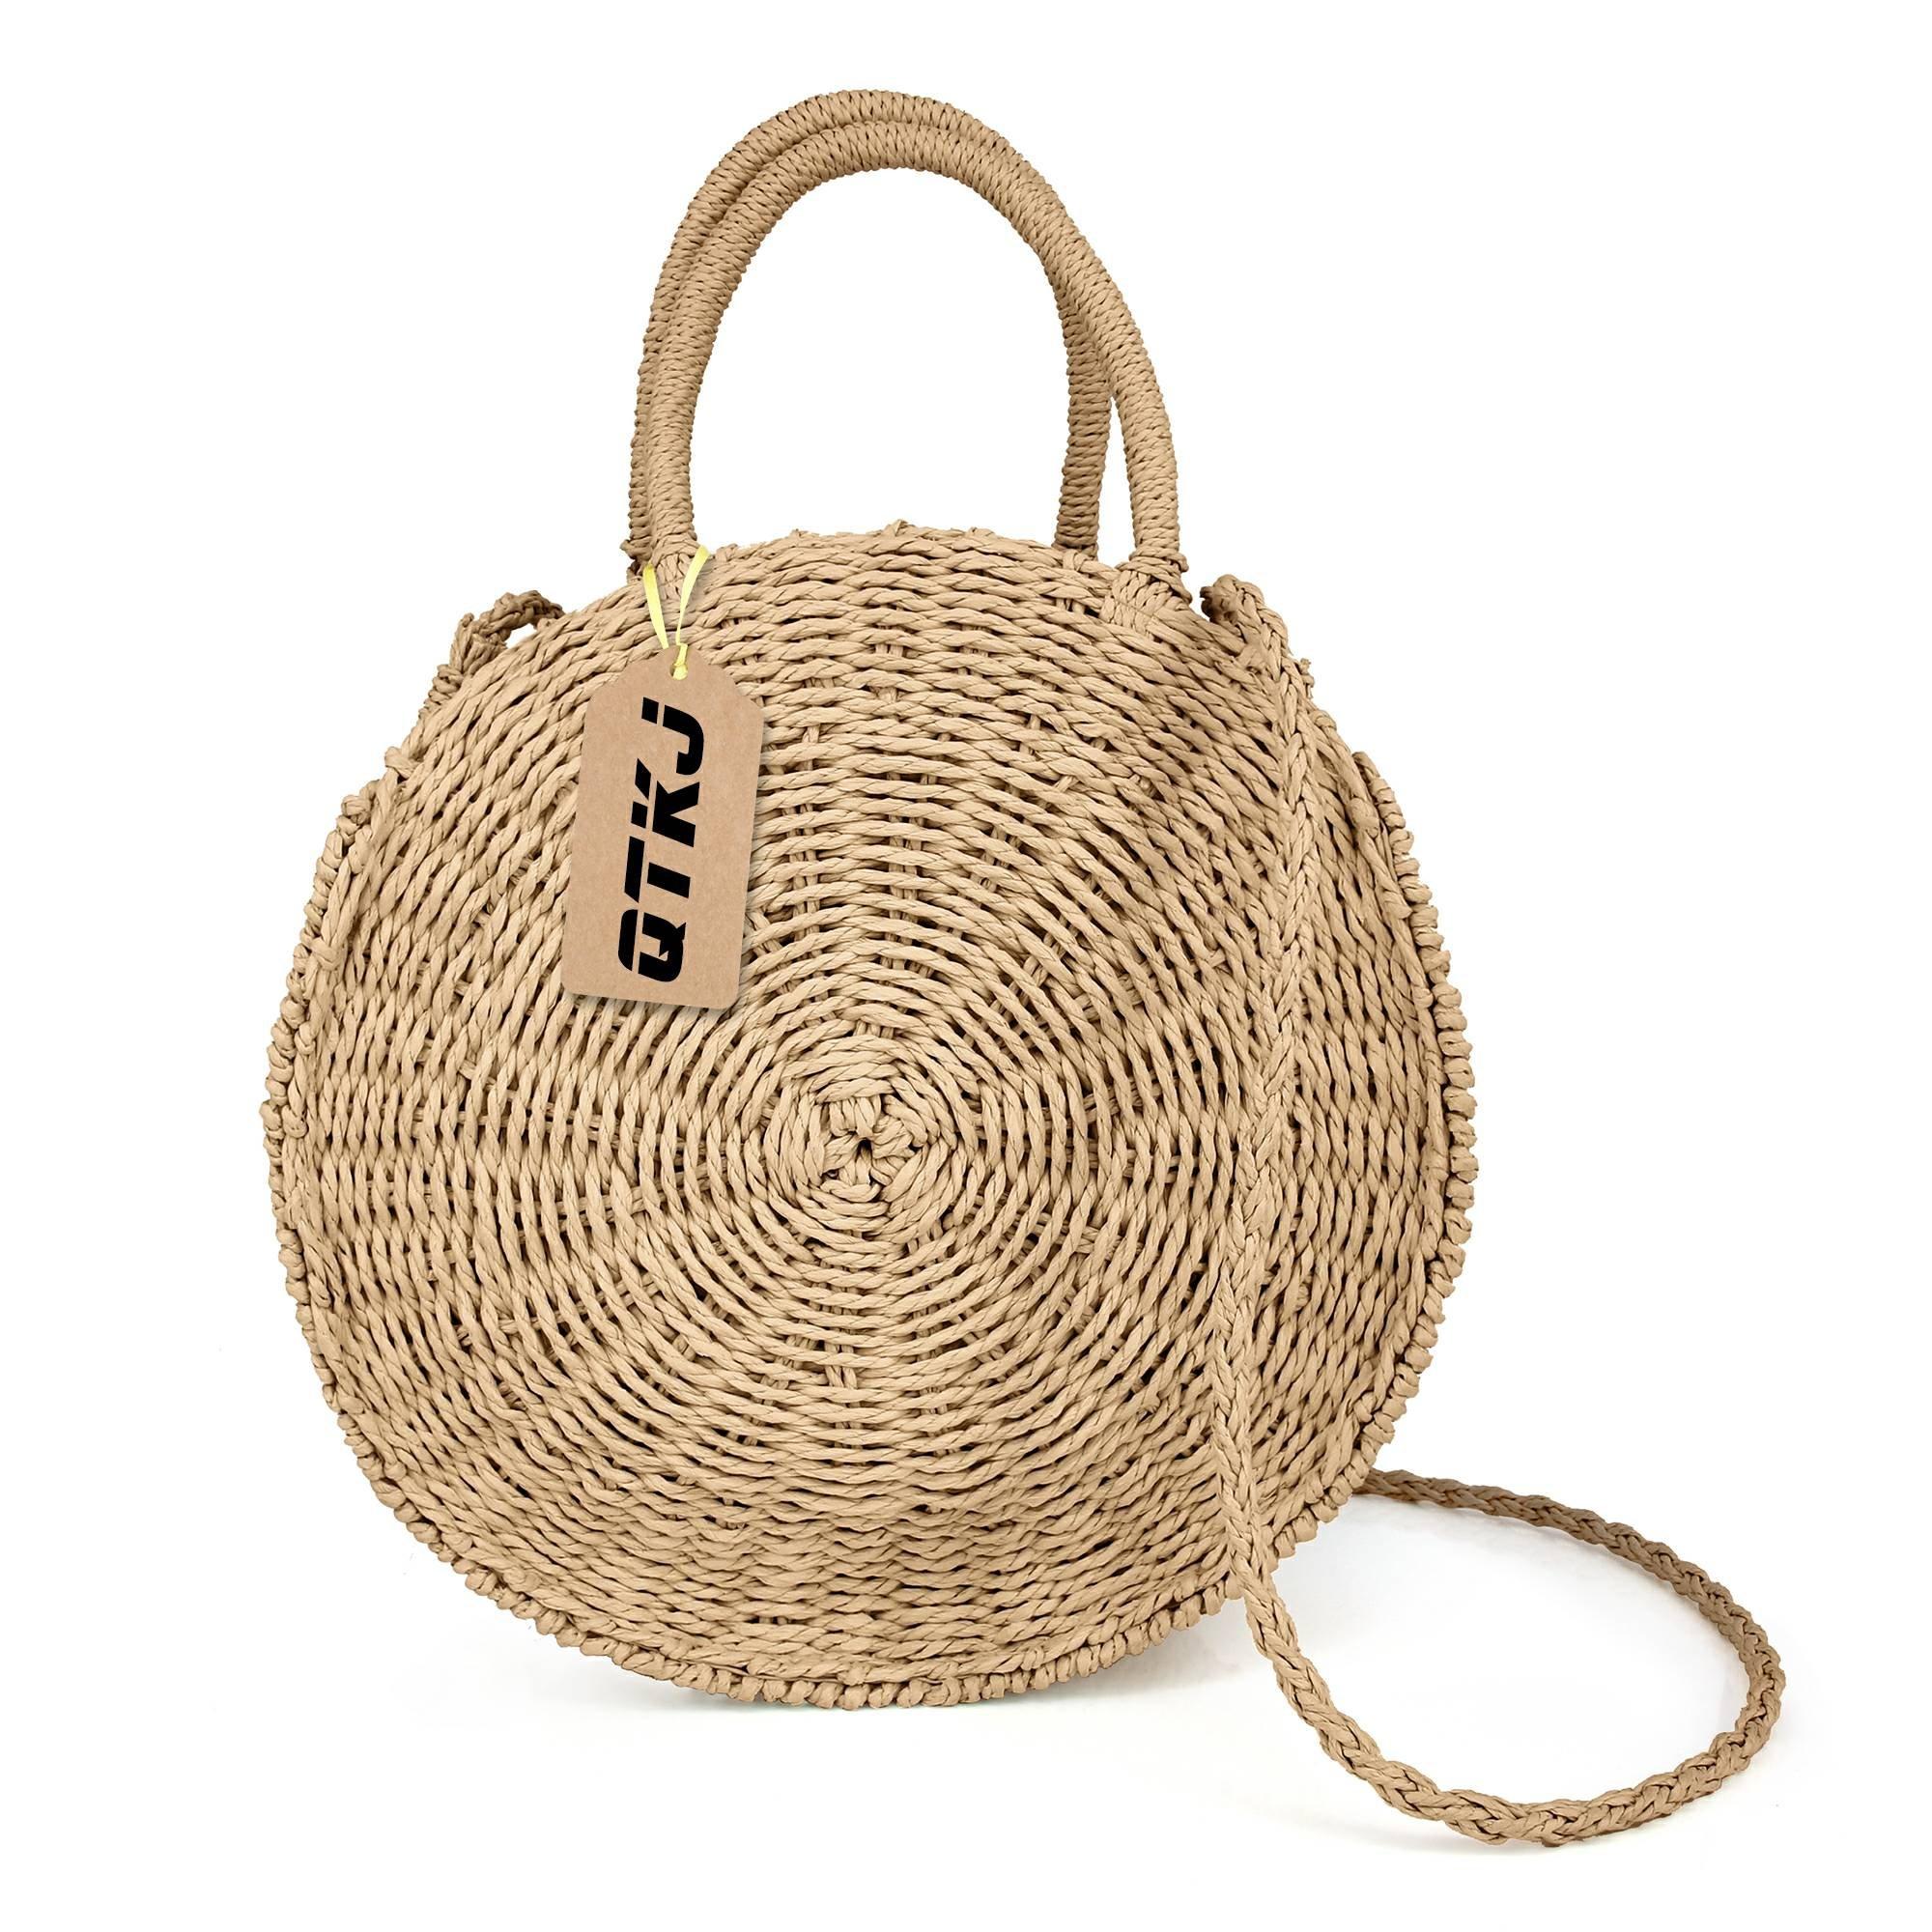 Women Straw Summer Beach Bag Handwoven Round Rattan Bag Cross Body Bag Shoulder Messenger Satchel (khaki)